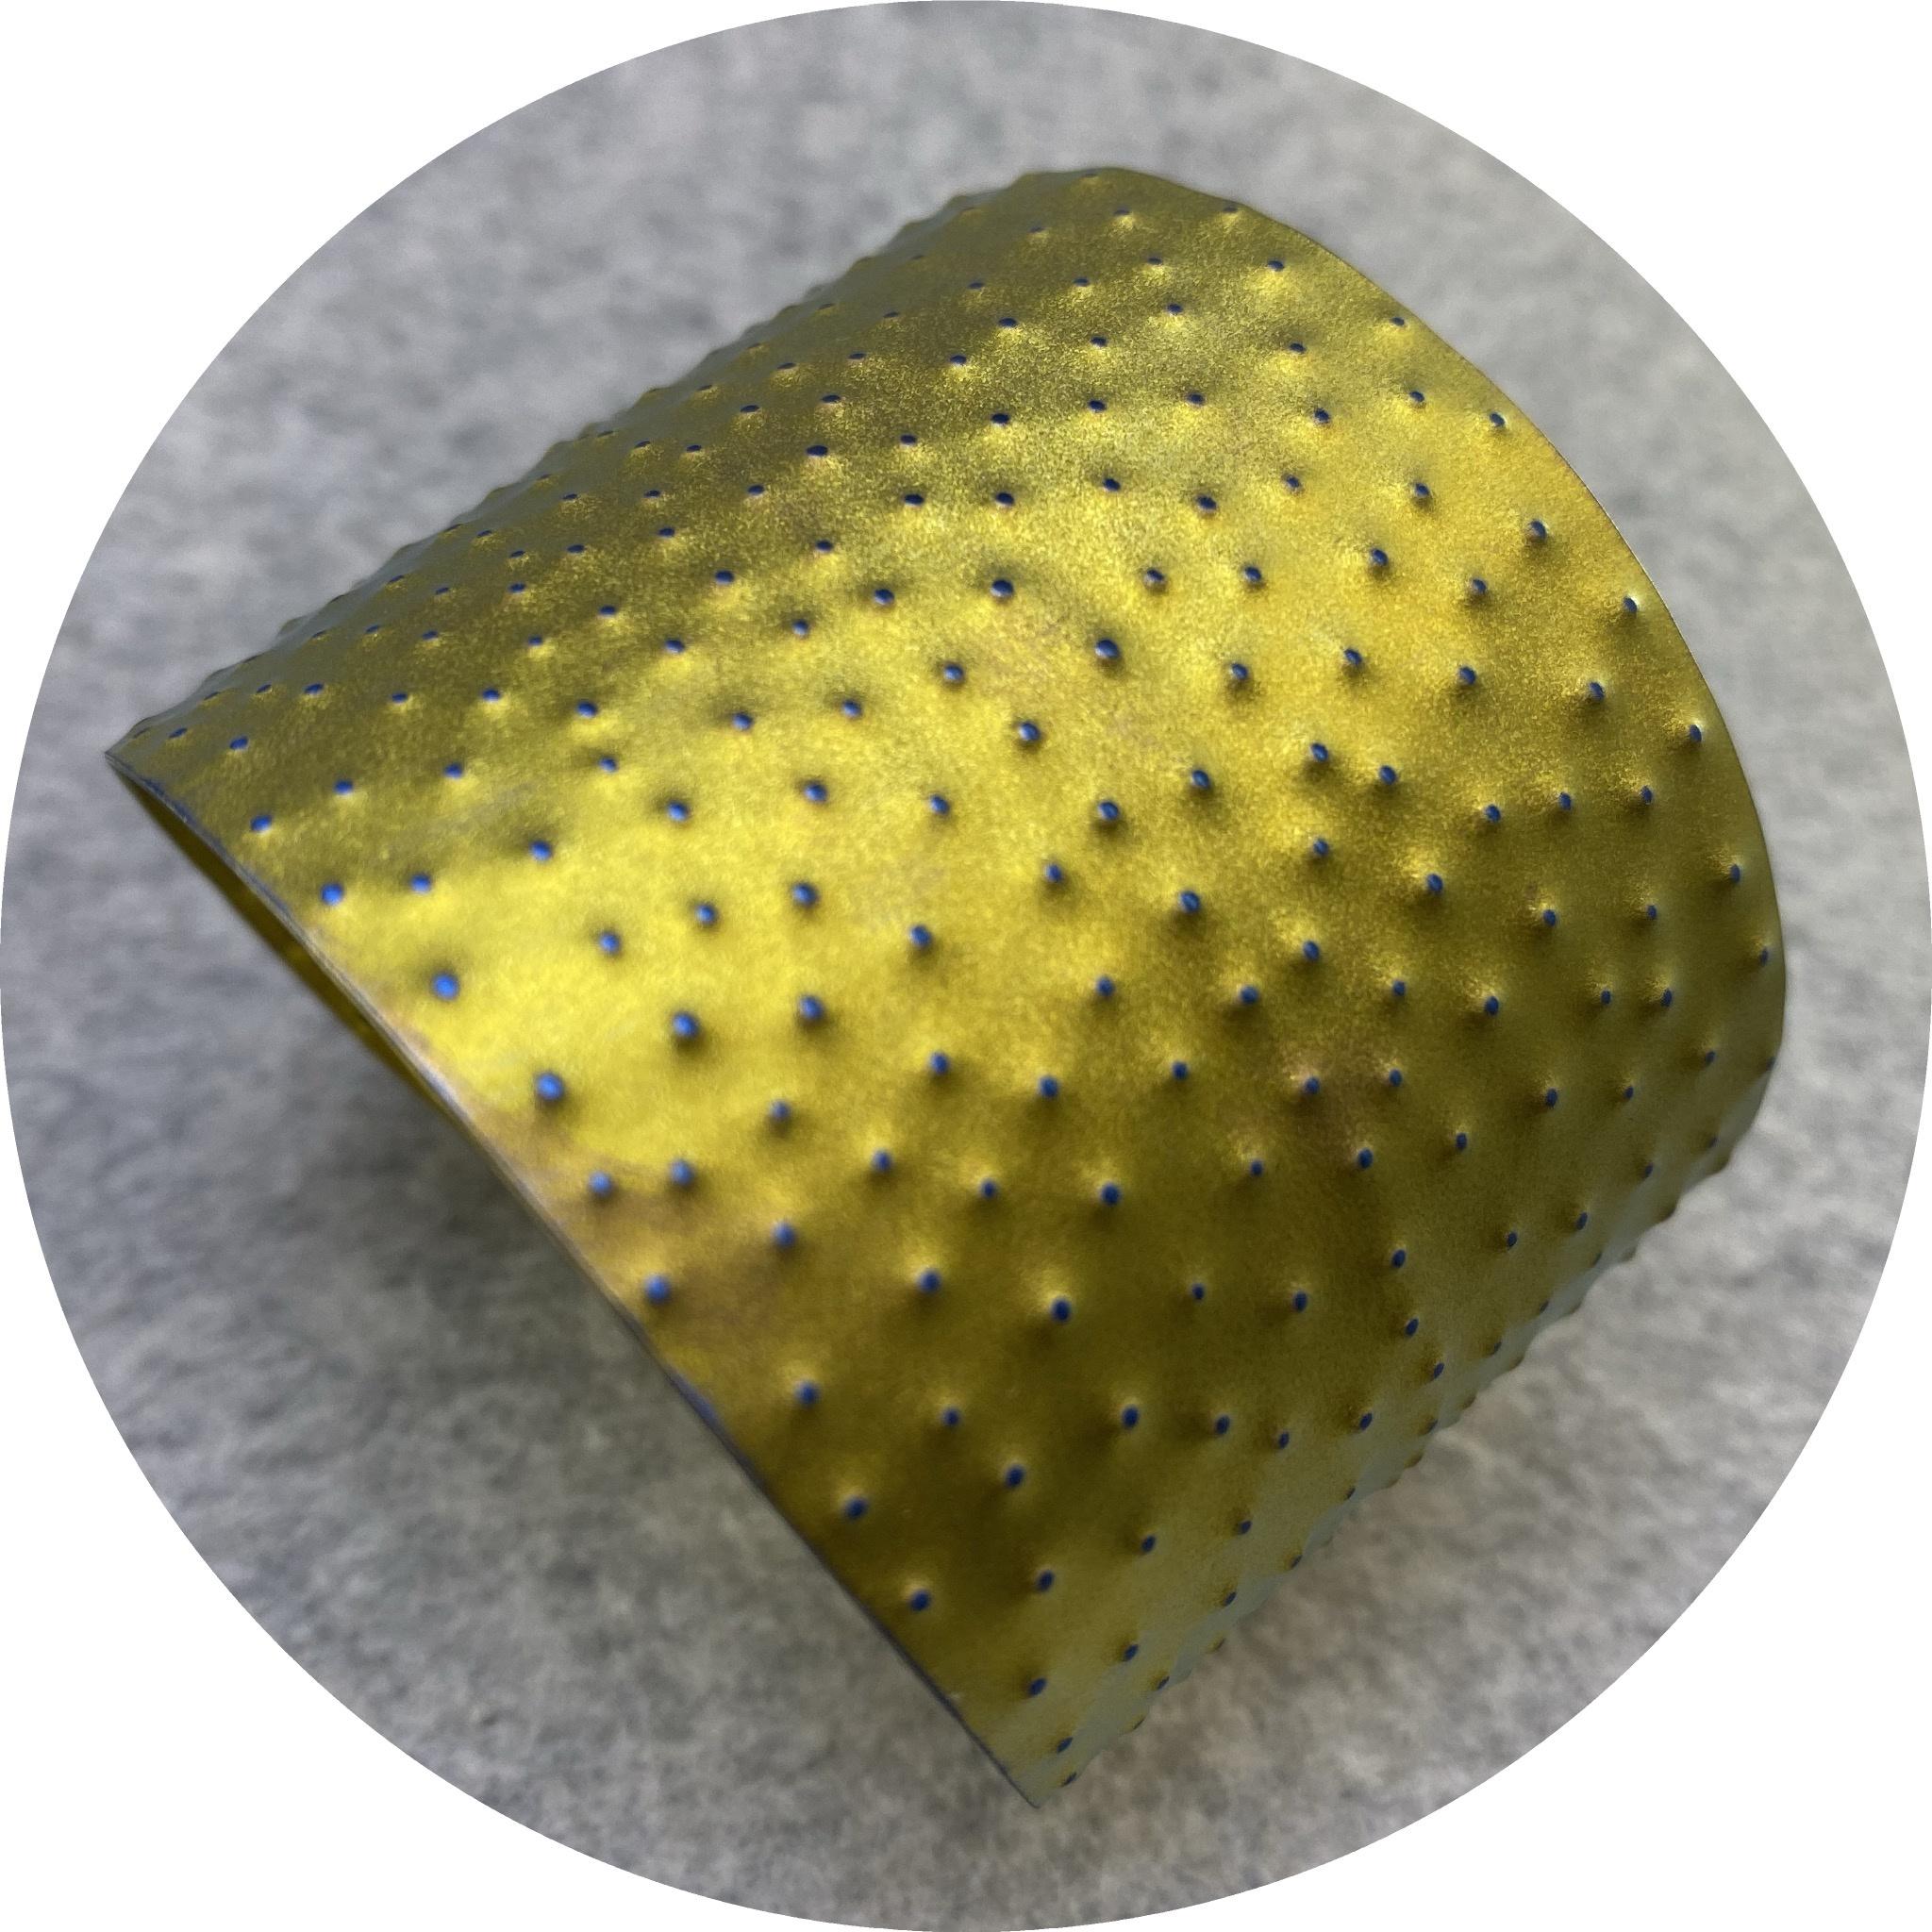 Amanda Croatto - 'Golden Cuff', titanium